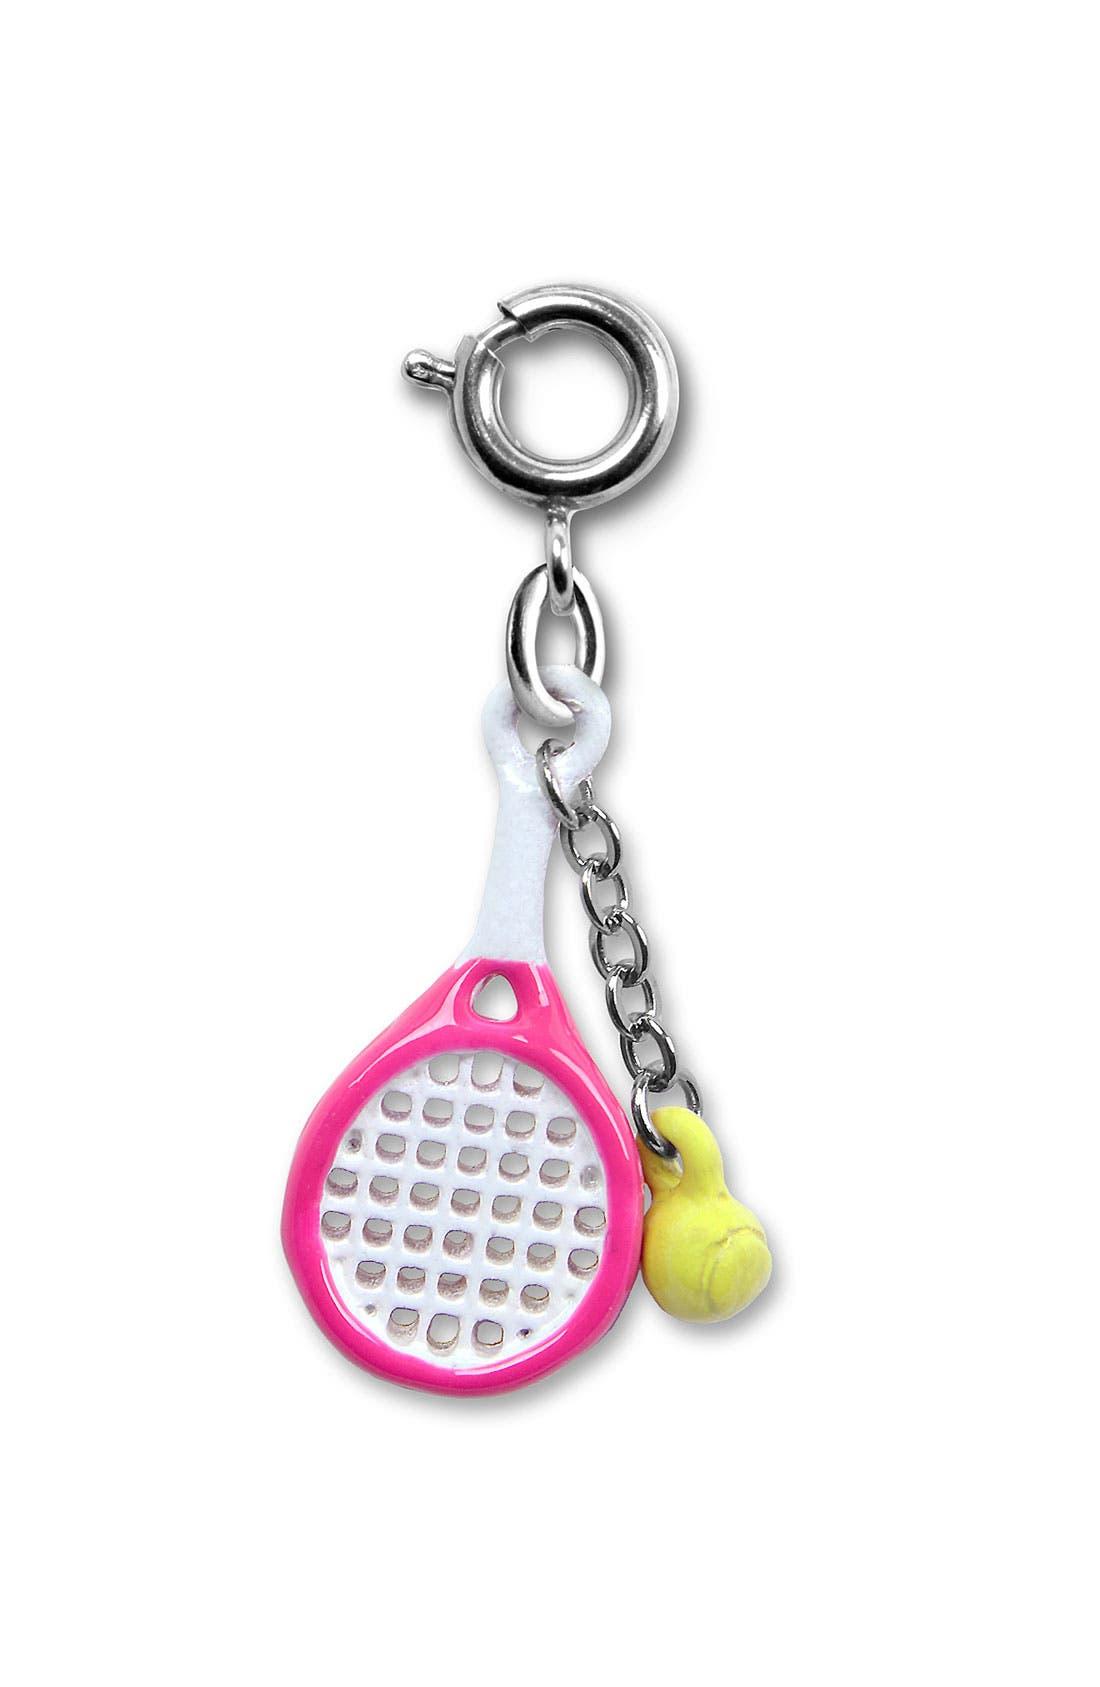 Alternate Image 1 Selected - CHARM IT!® 'Tennis' Charm (Girls)